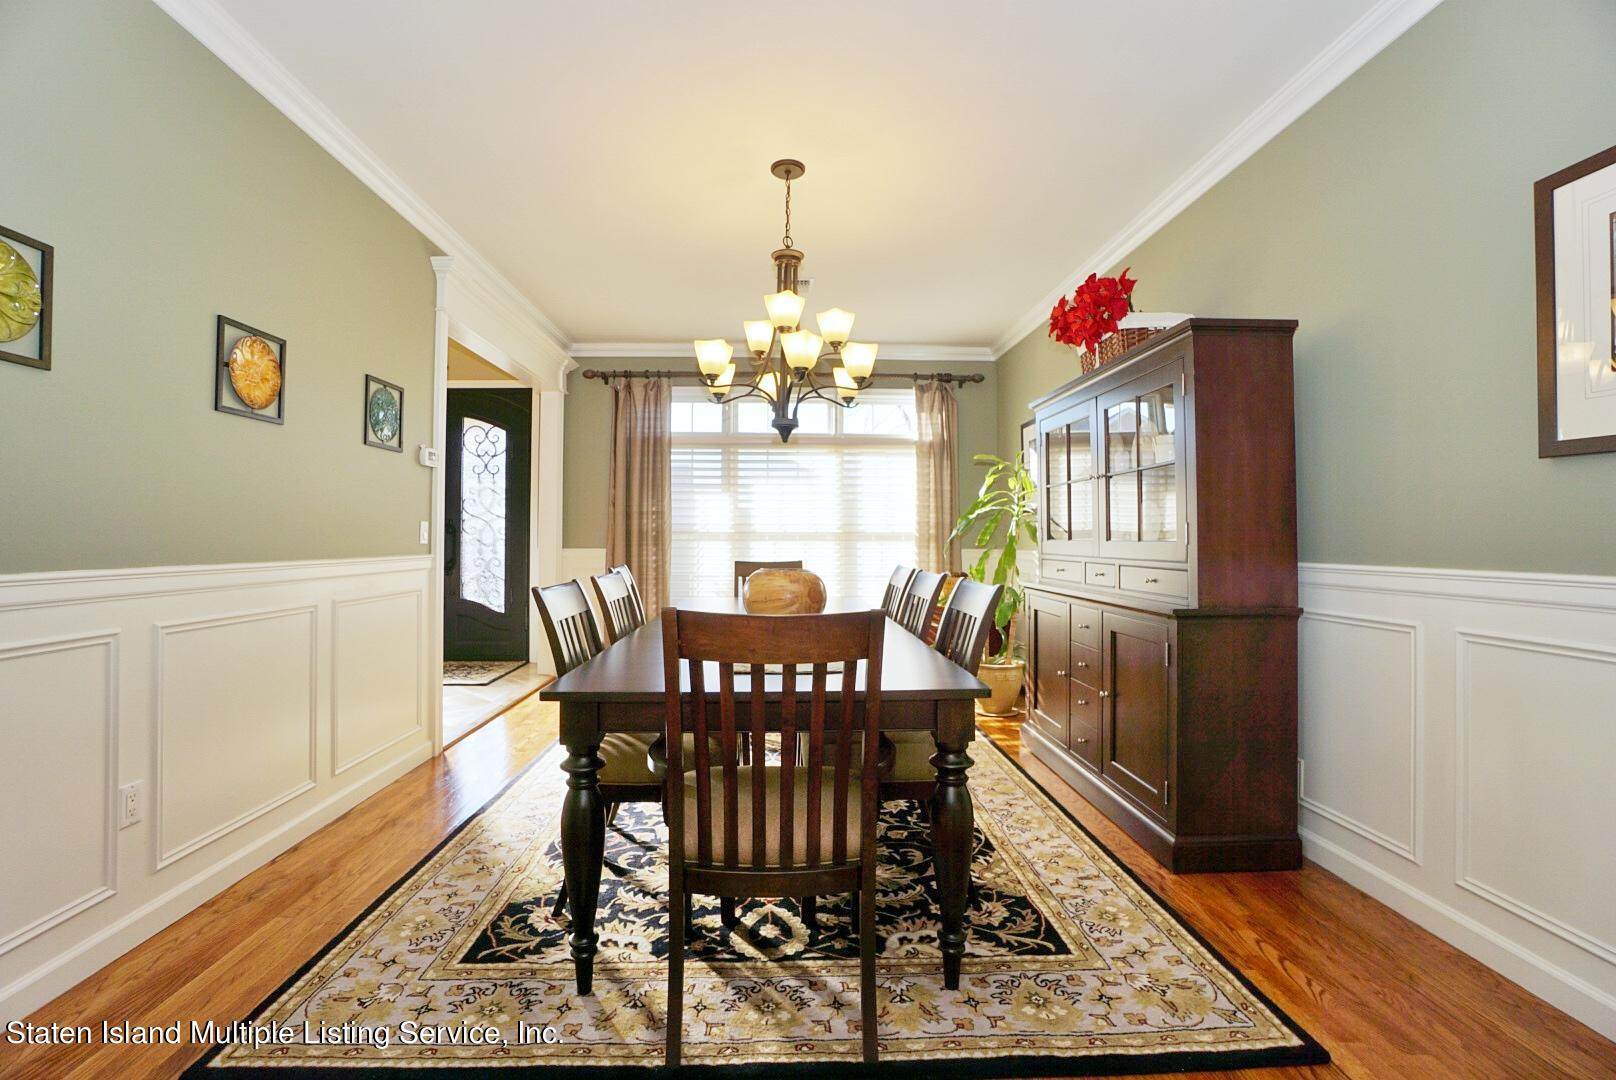 Single Family - Detached 31 Belwood Loop  Staten Island, NY 10307, MLS-1143133-11